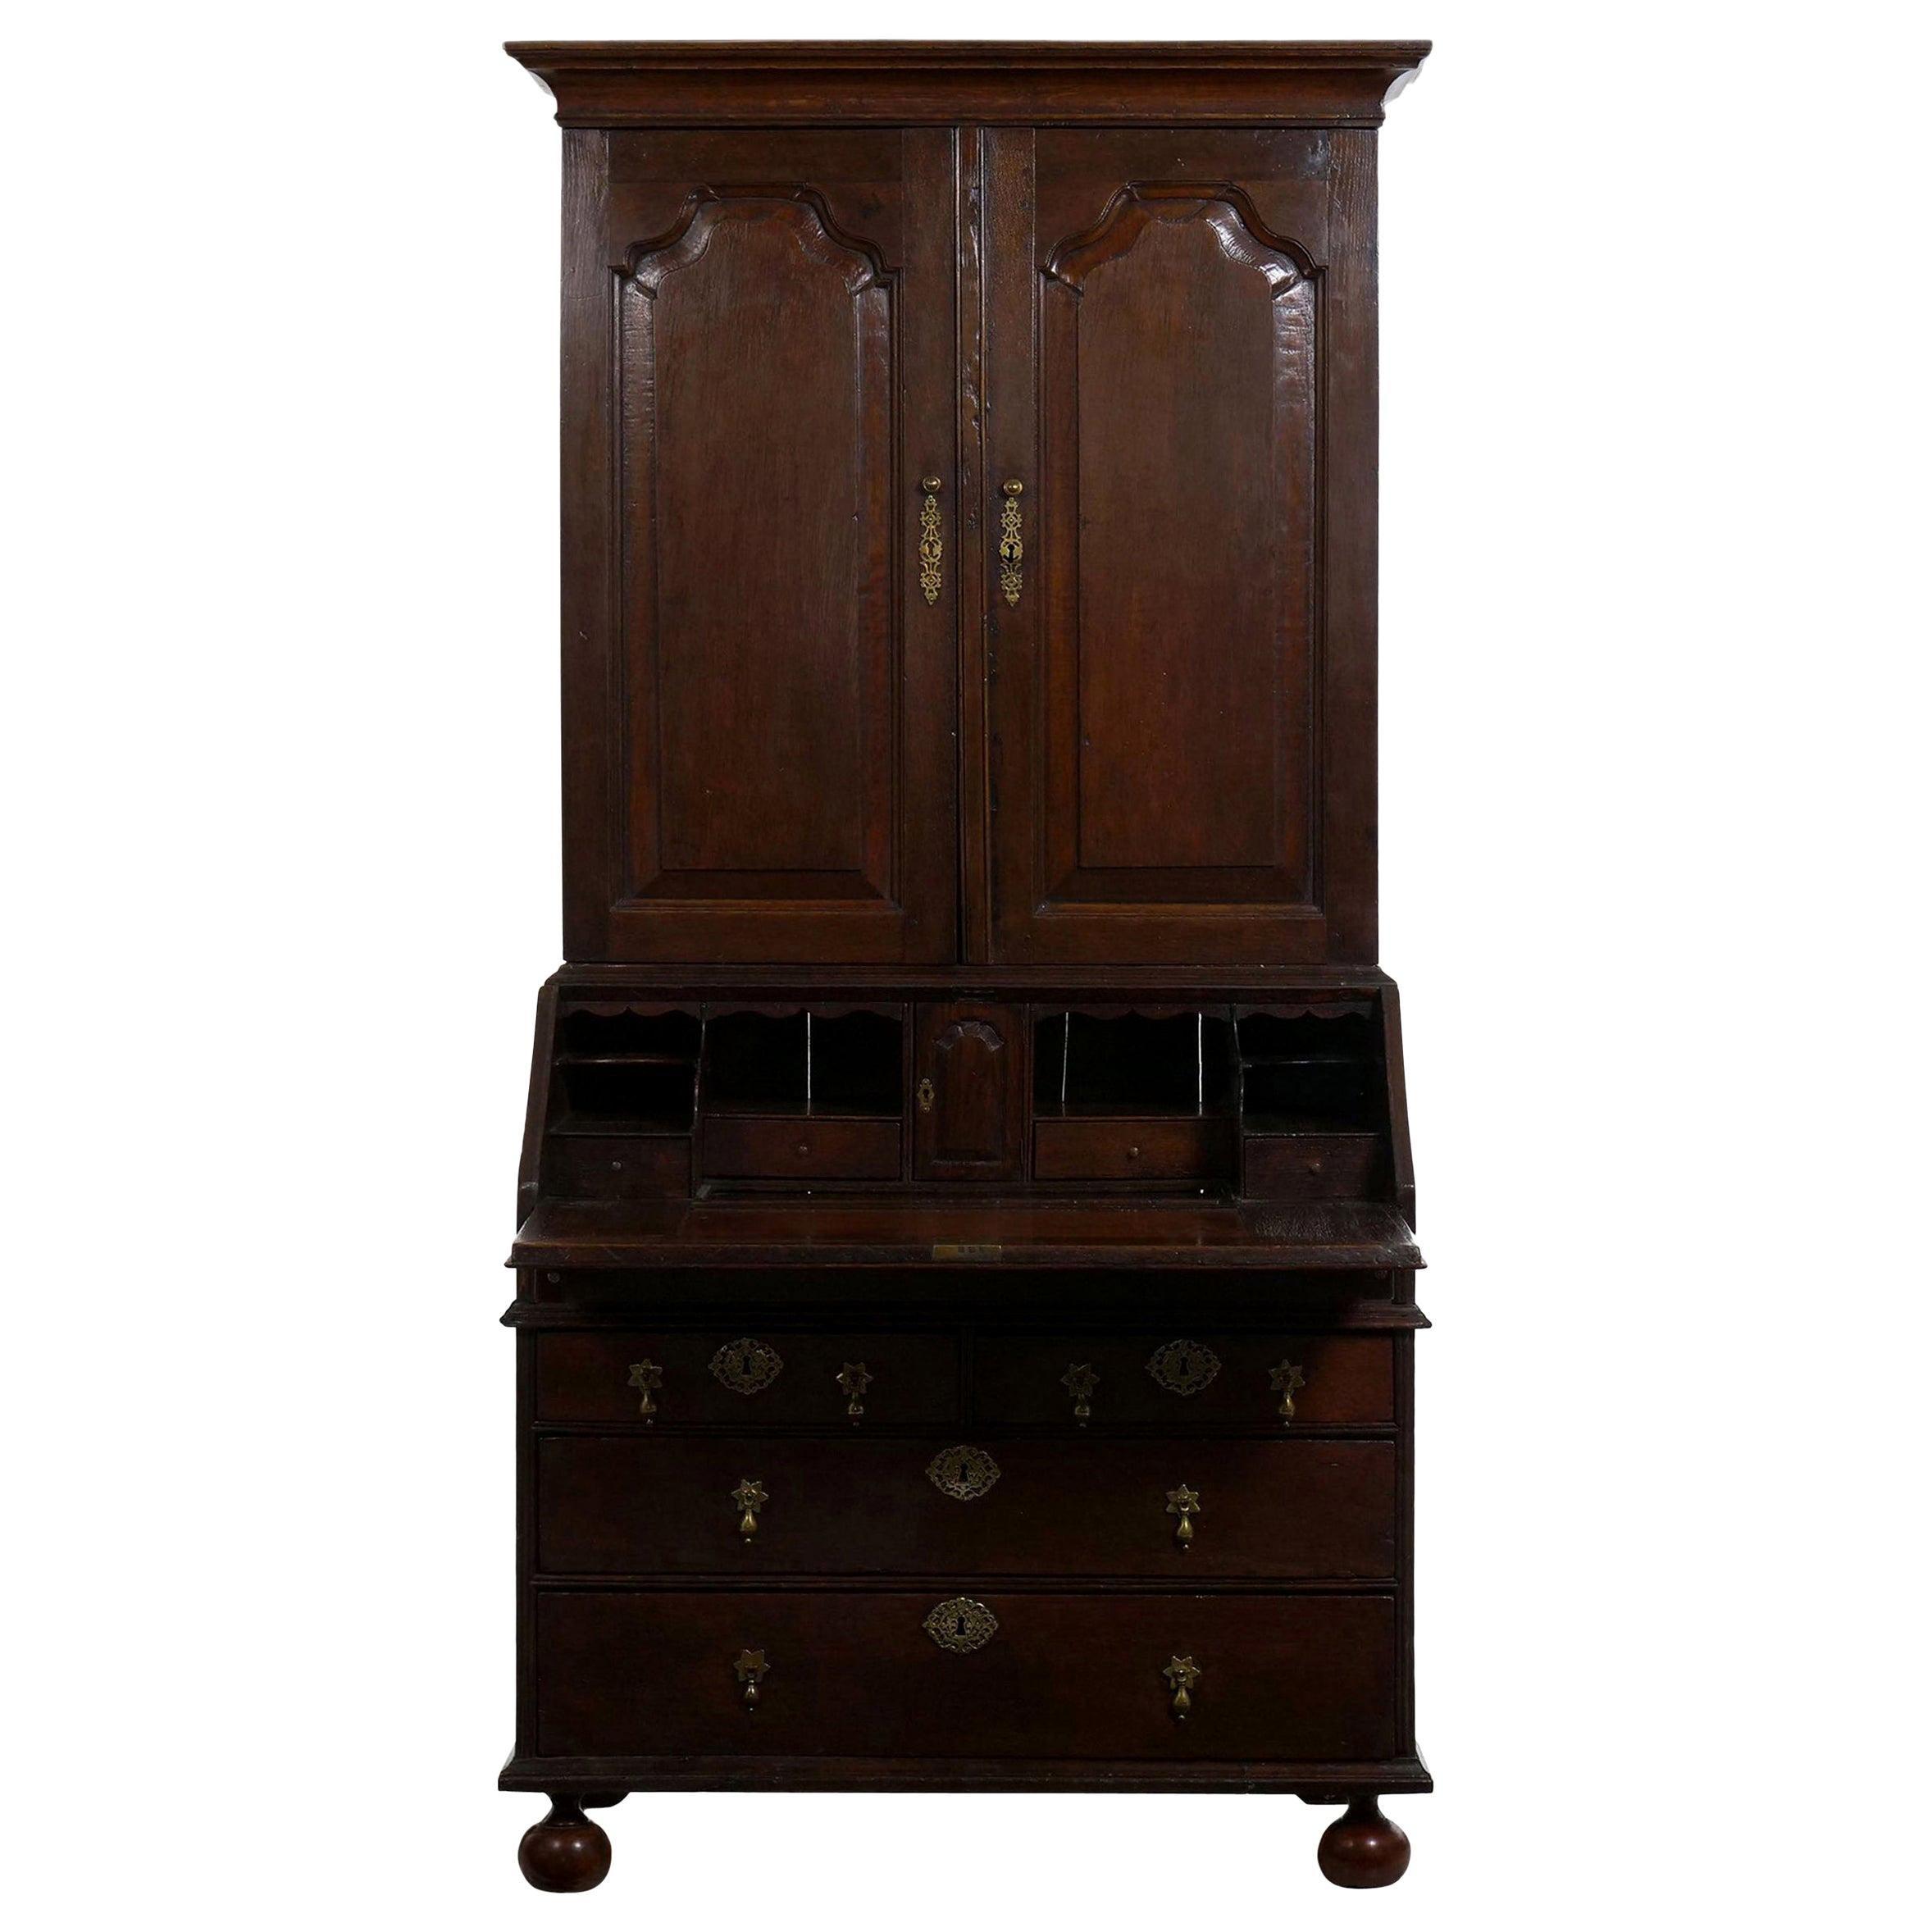 English Queen Anne Style Oak Antique Secretary Desk with Bookcase, 18th Century